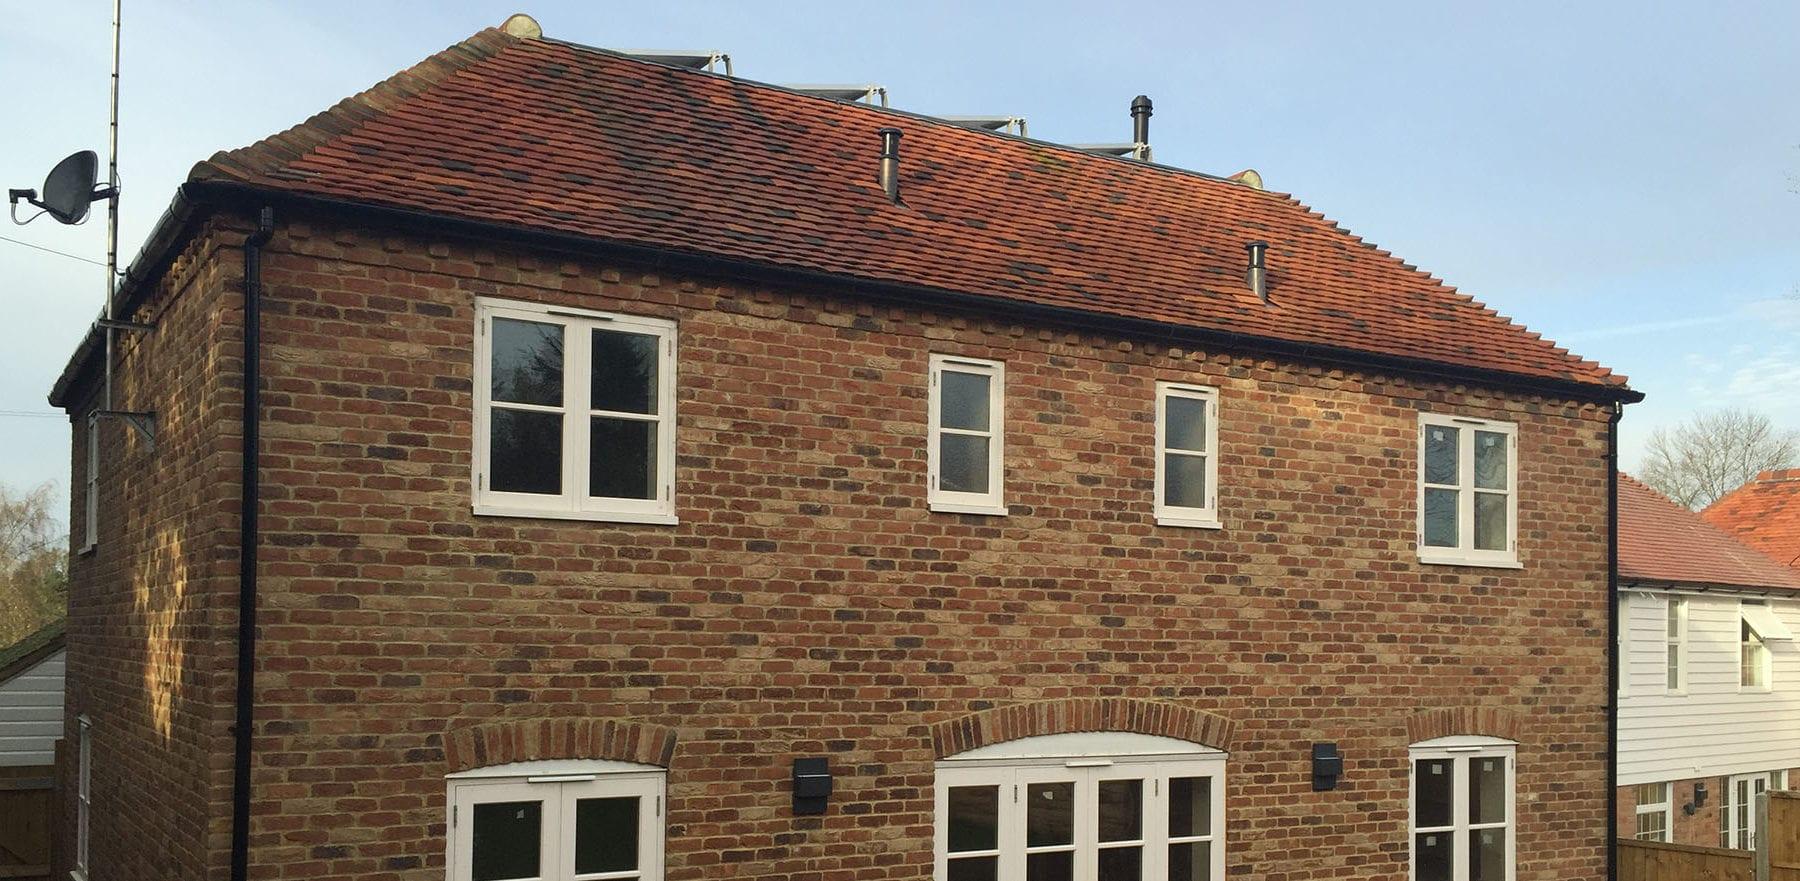 Lifestiles - Handmade Multi Clay Roof Tiles - Tenterden, England 2